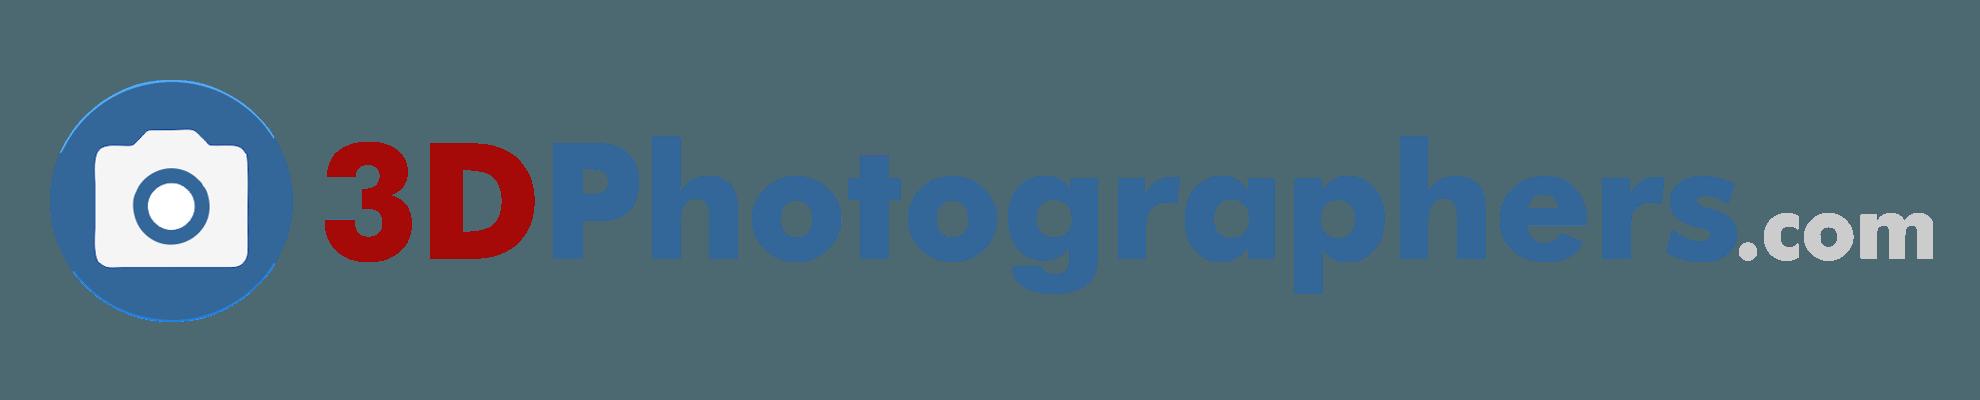 3dphotographers